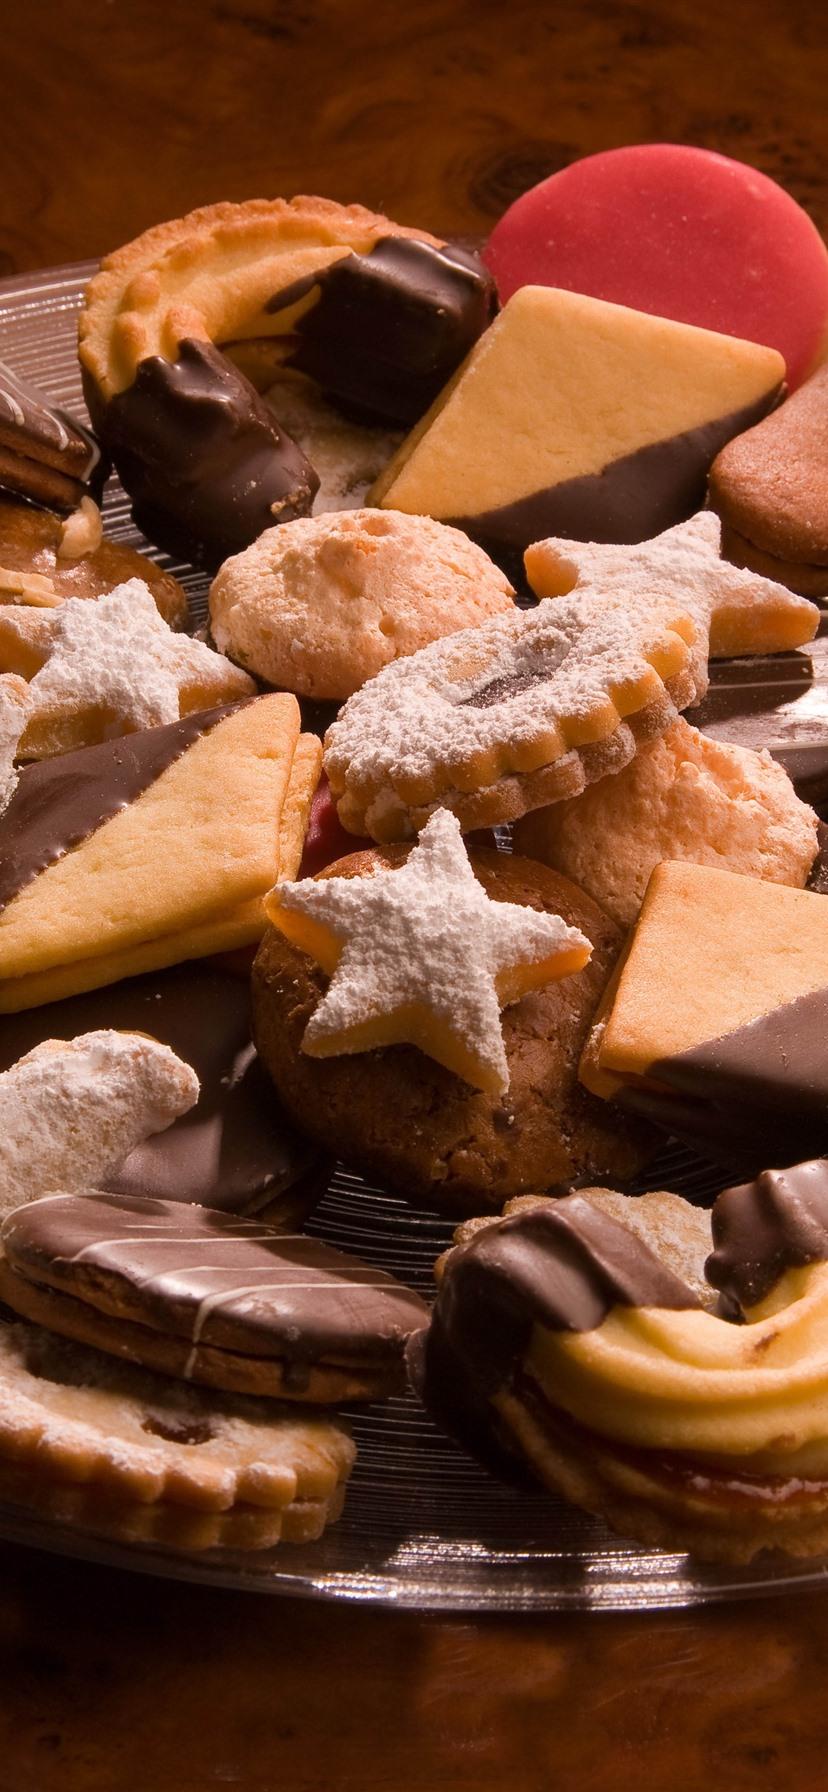 Печенье и шоколад картинка